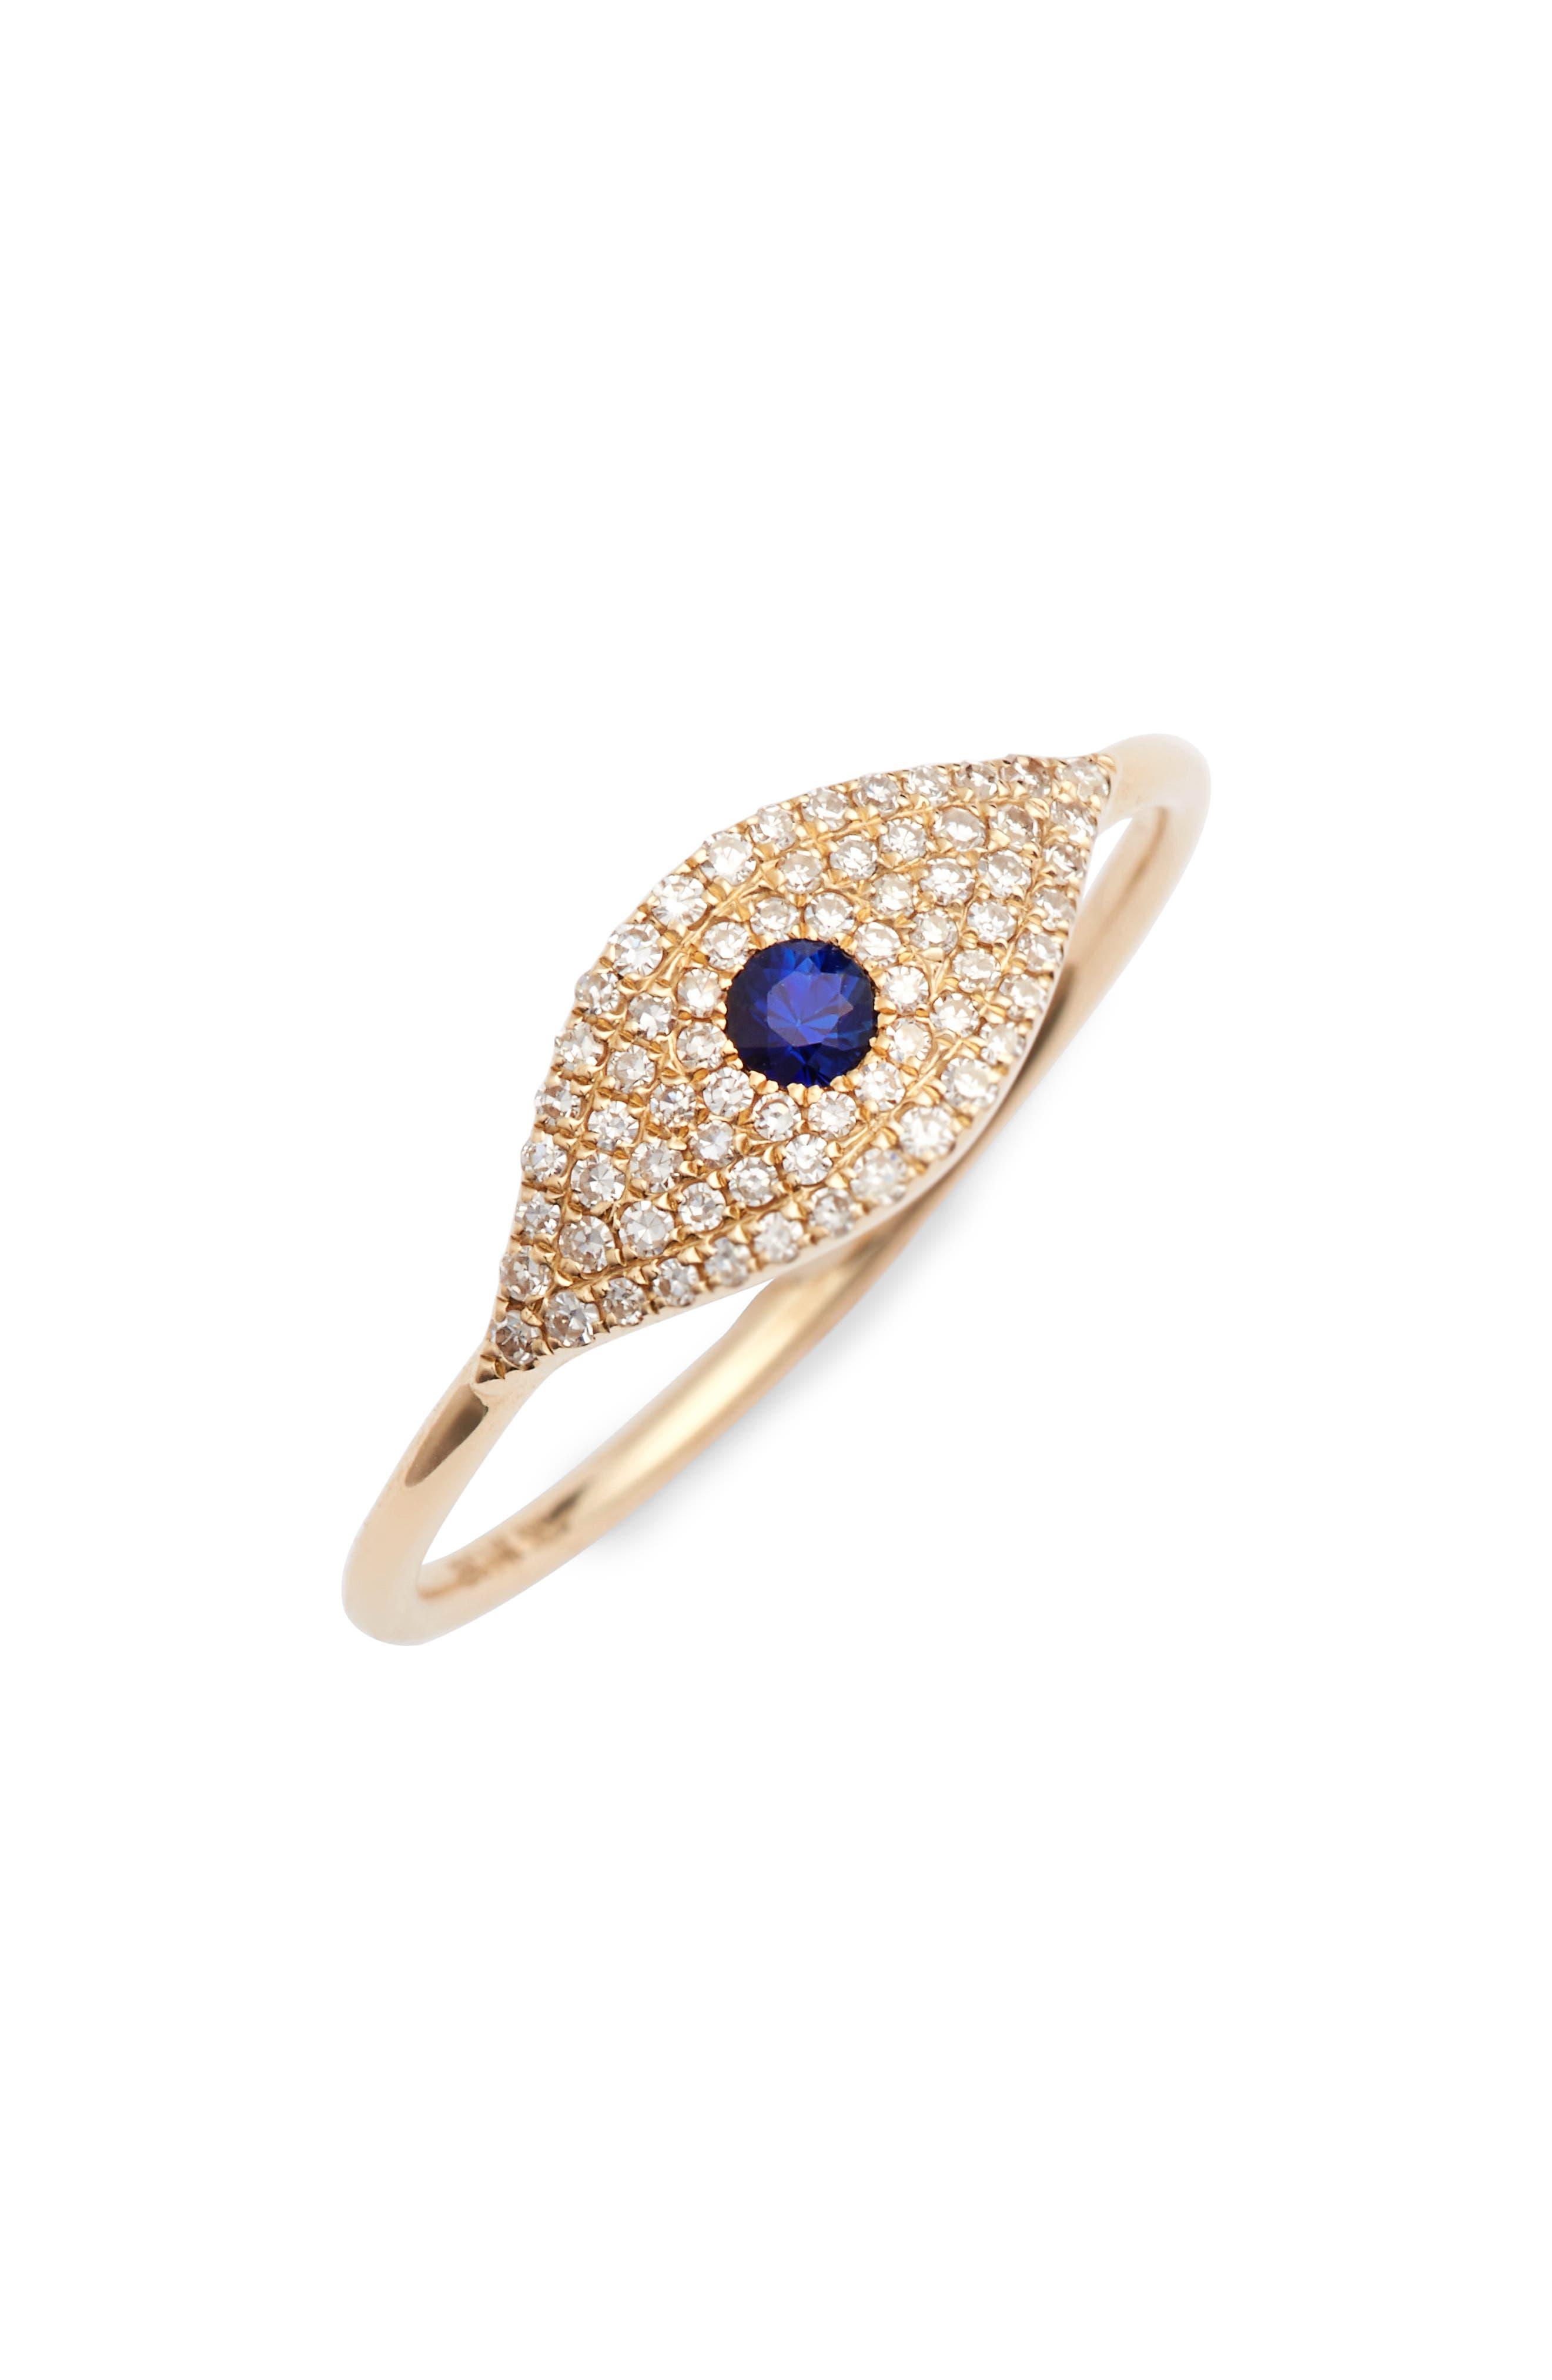 Jumbo Evil Eye Stack Diamond & Sapphire Stack Ring,                         Main,                         color, Yellow Gold/ Sapphire